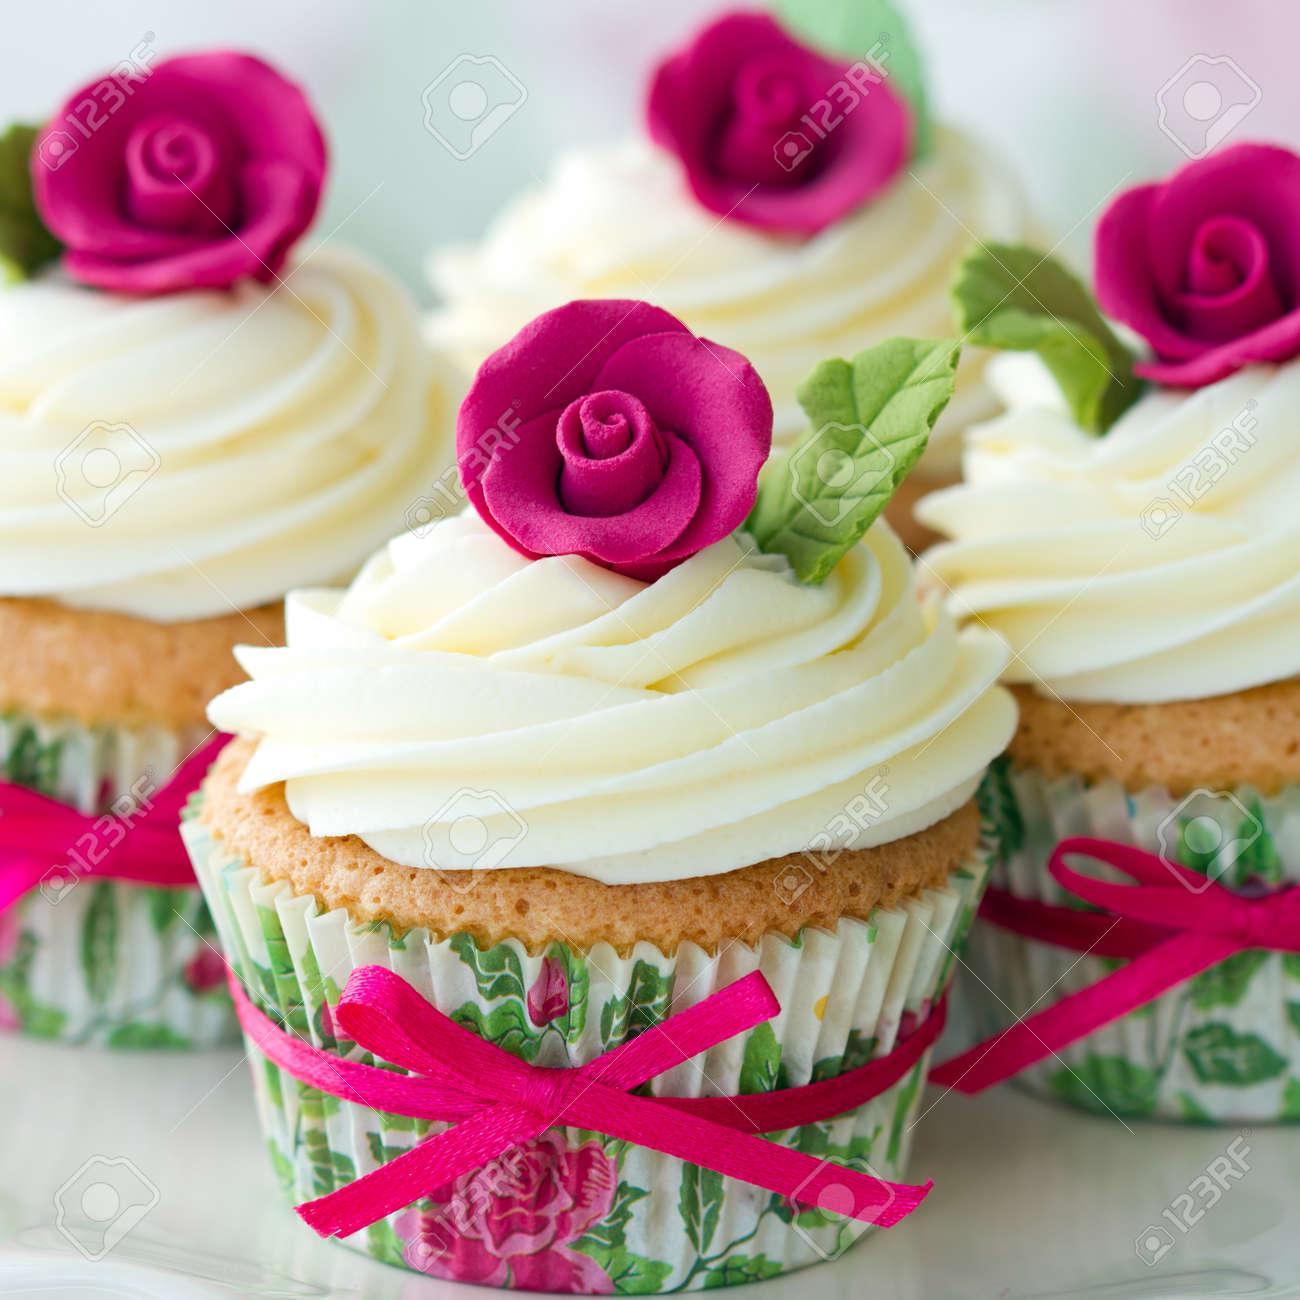 Cupcakes Decorados Con Rosas De Azúcar De Color Rosa